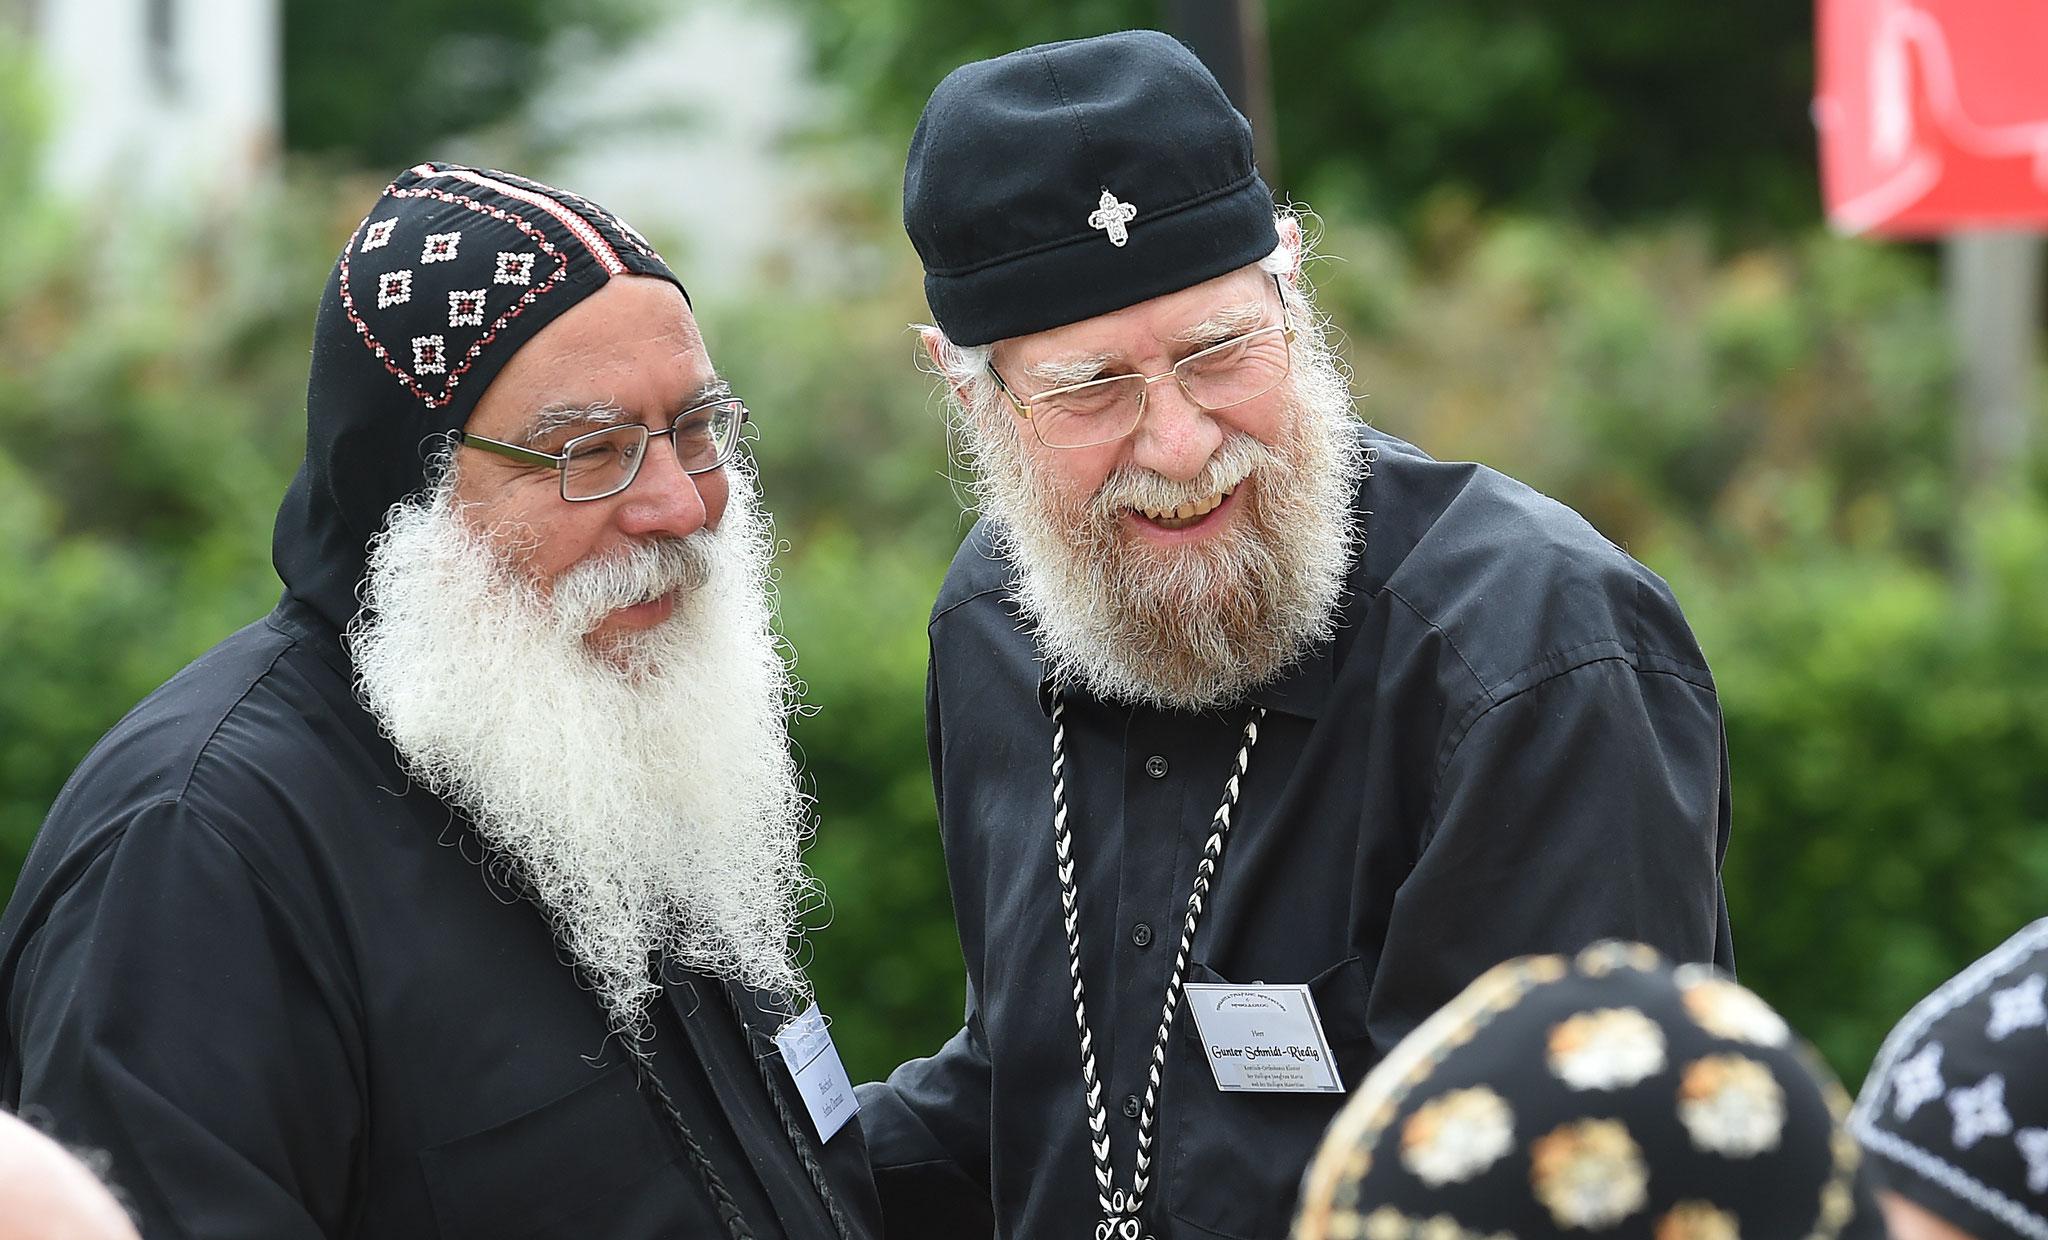 S.E. Bischof Anba Damian und Diakon Gunter Schmidt-Riedig. Foto: Maria Hopp